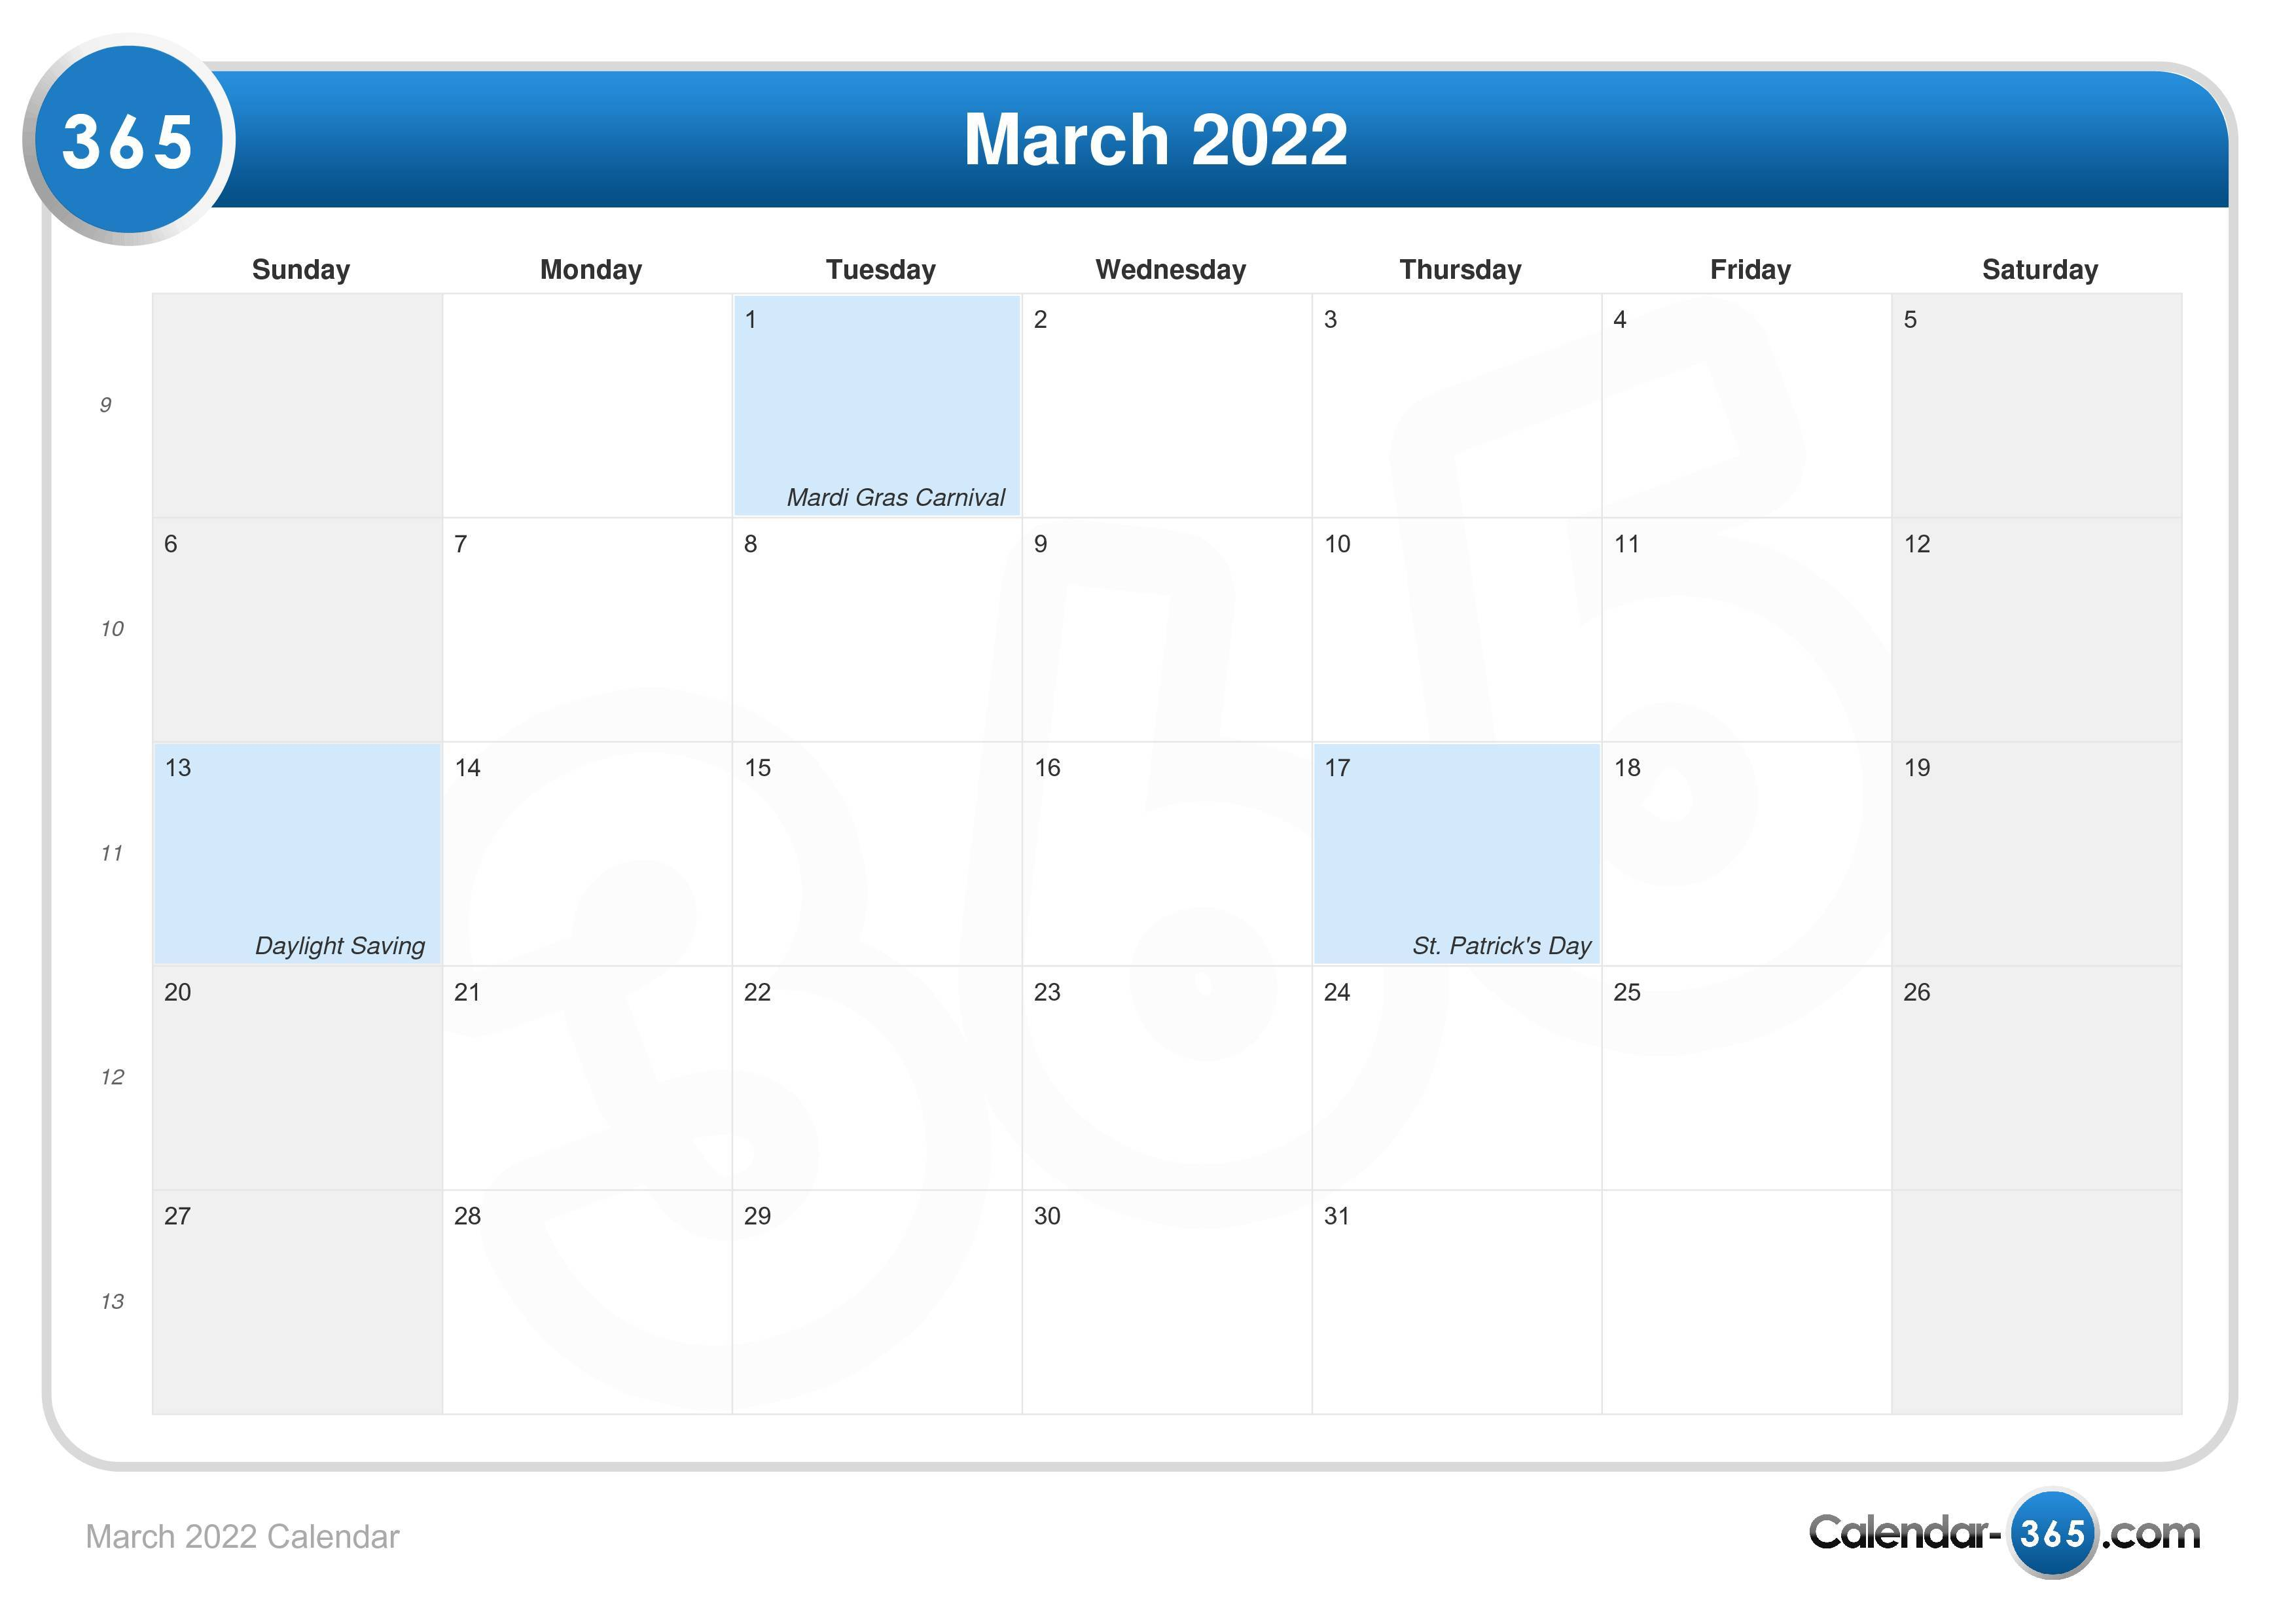 January February March 2022 Calendar.March 2022 Calendar